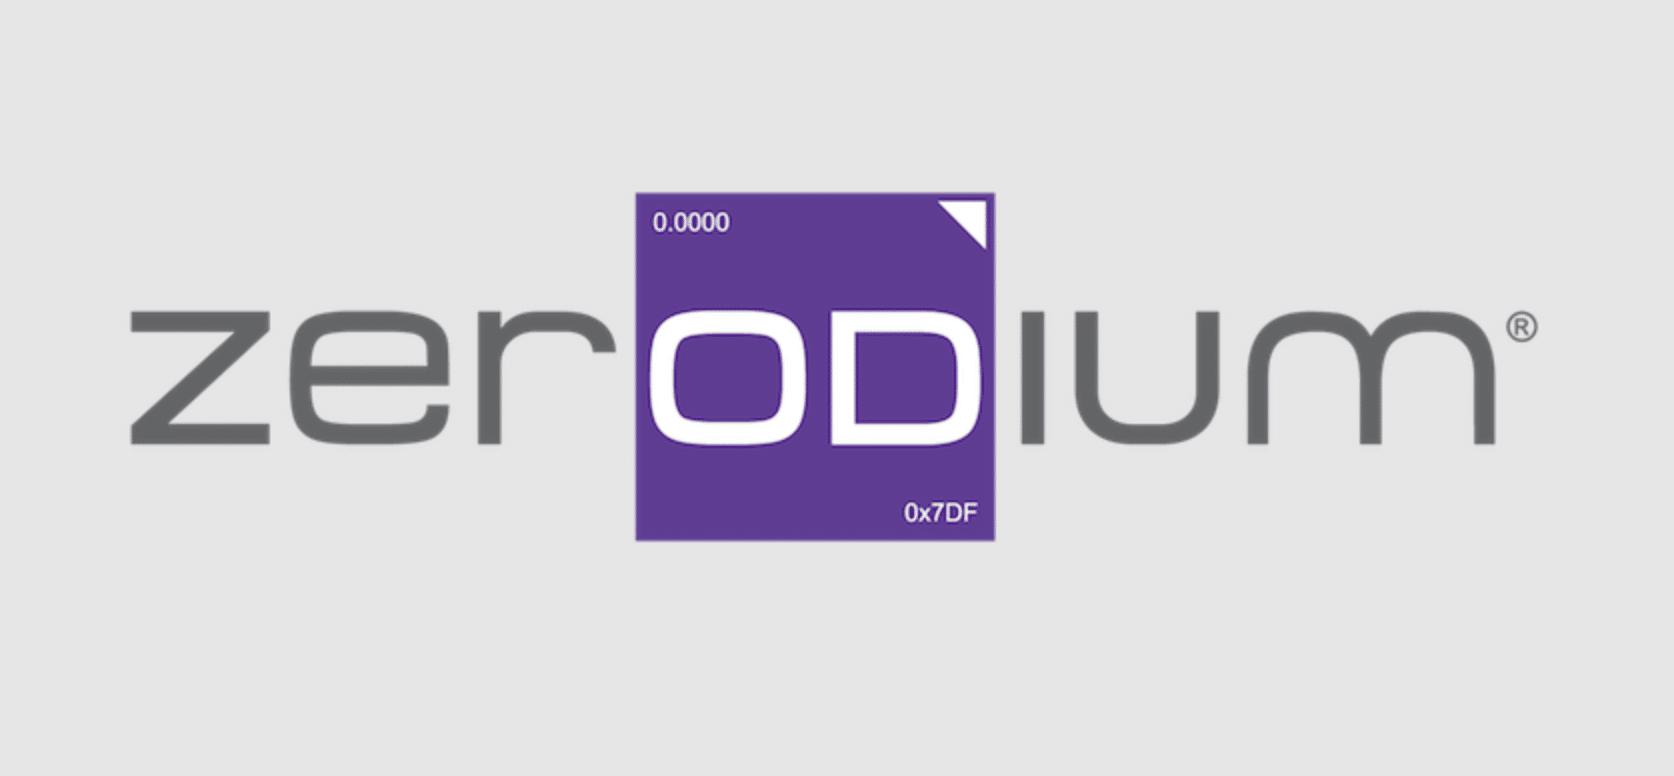 Zerodium Temporarily Triples Payout to $300K for WordPress Exploits